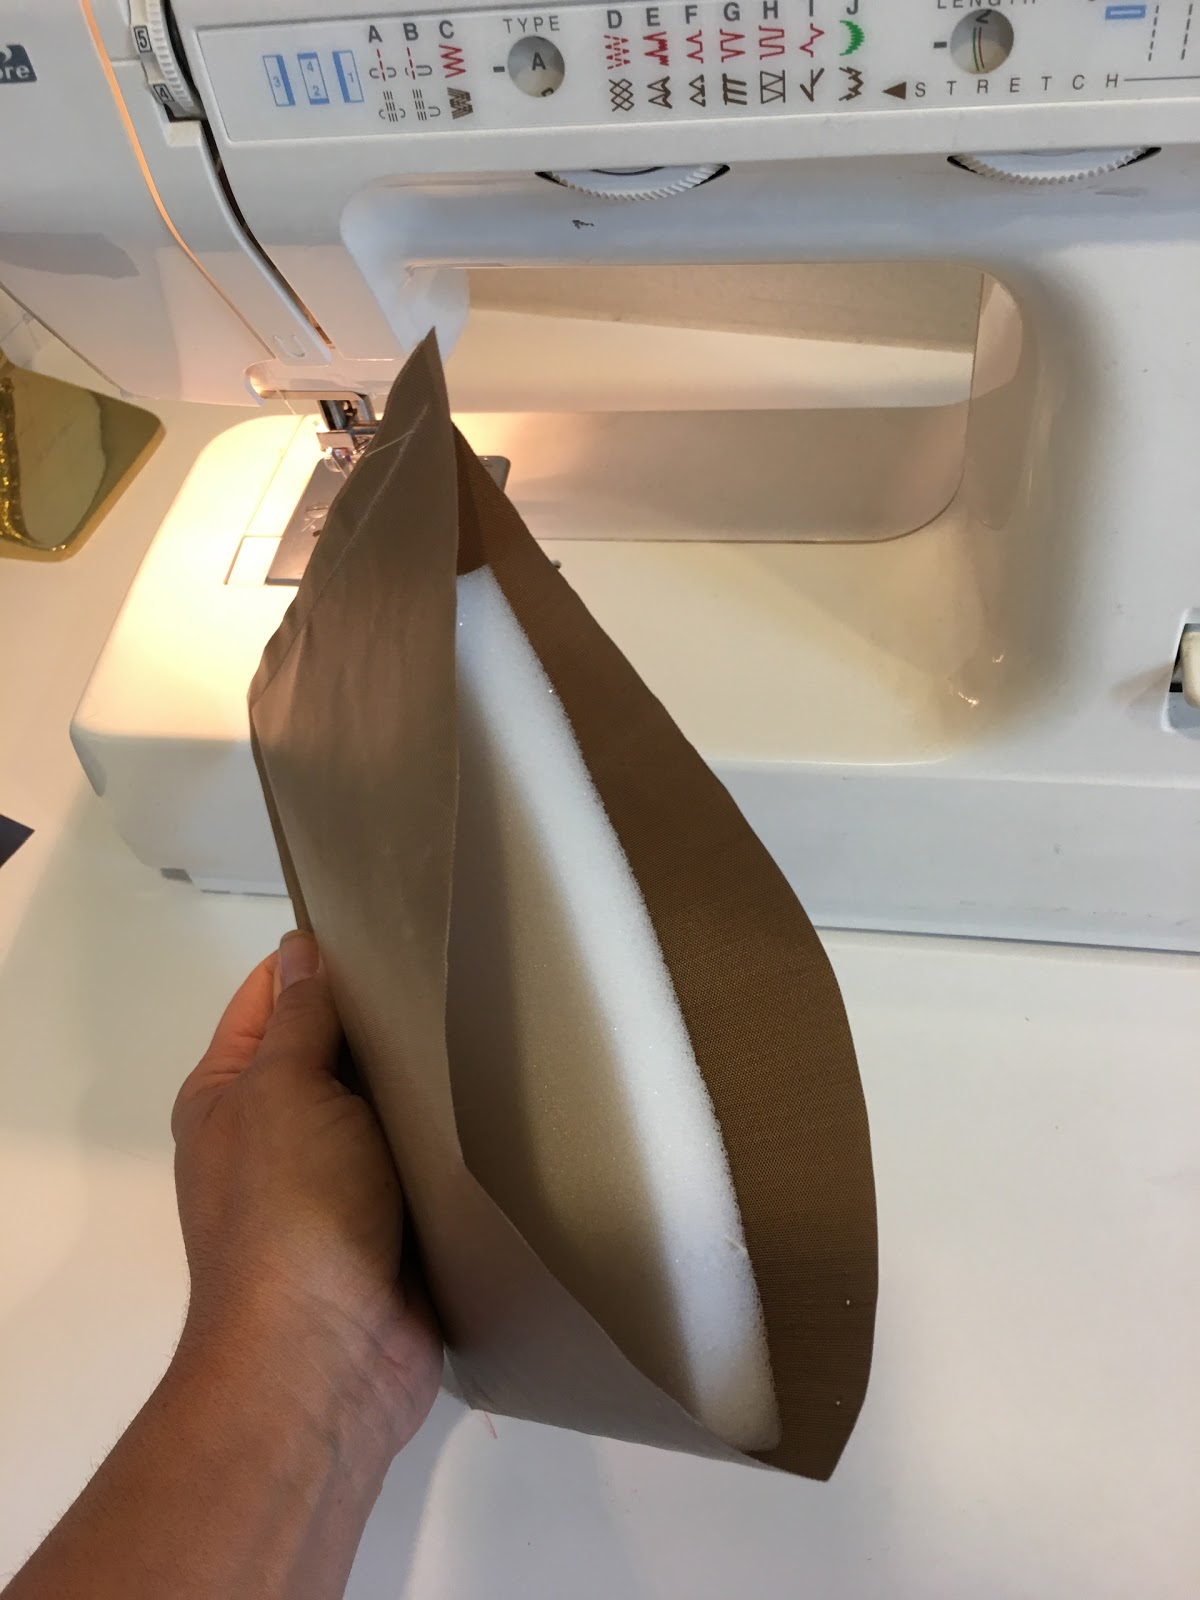 https www silhouetteschoolblog com 2017 09 heat press pillows how to make your own html